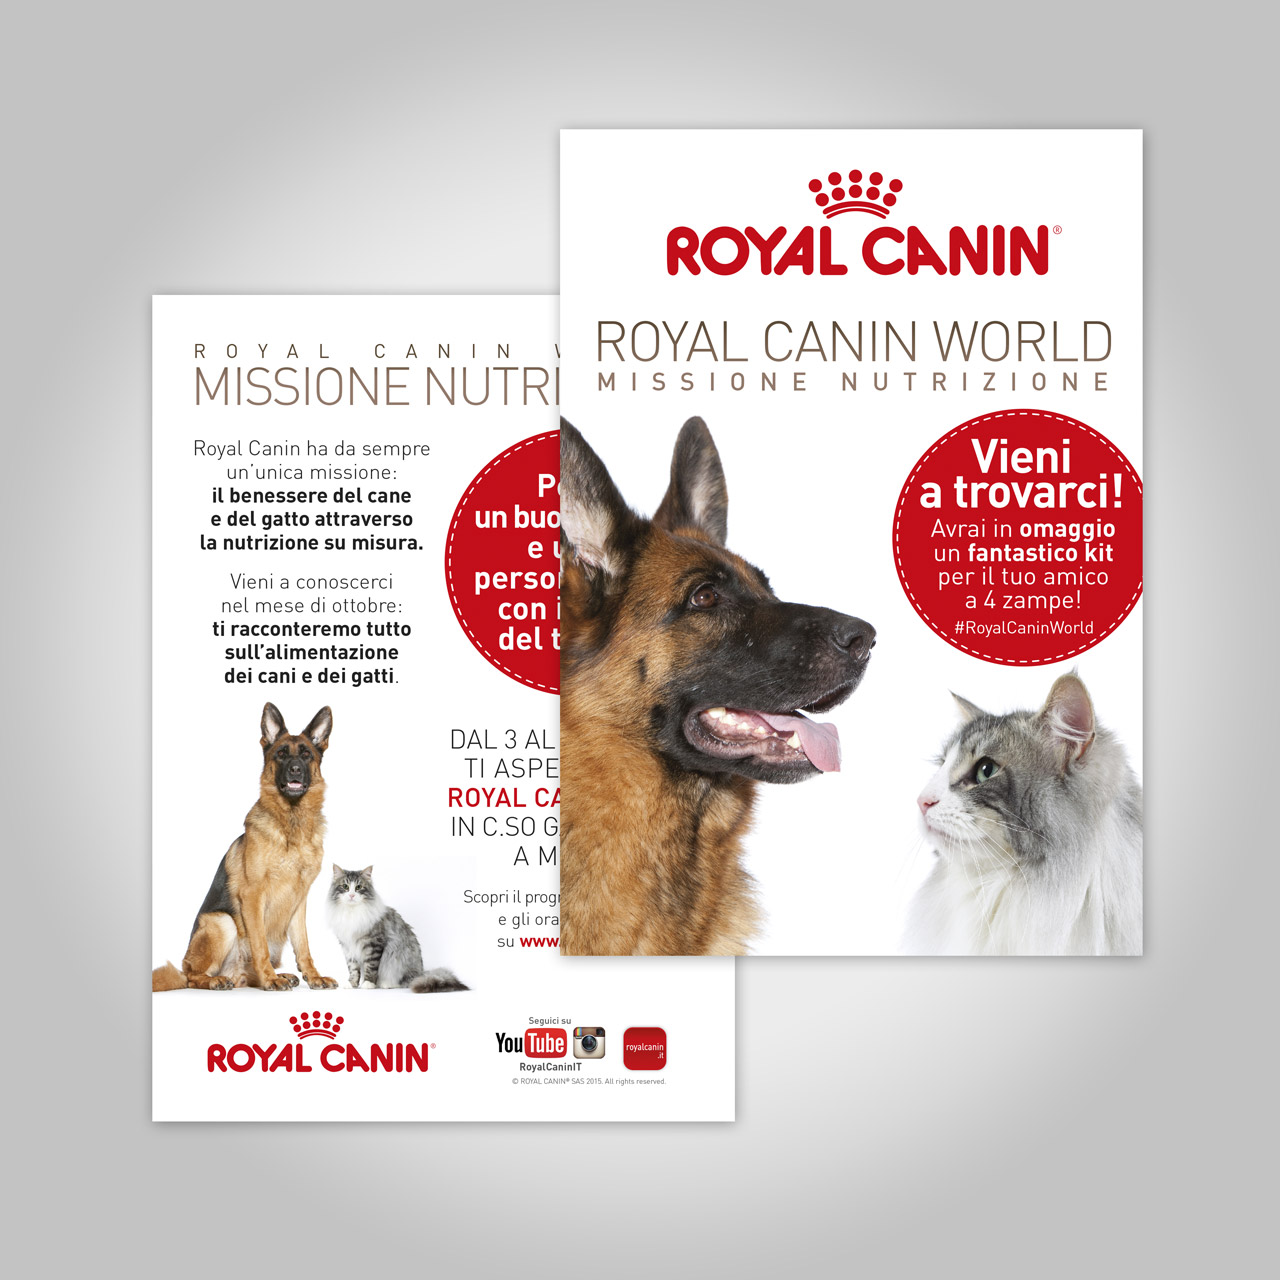 Locandina Royal Canin World Missione Nutrizione